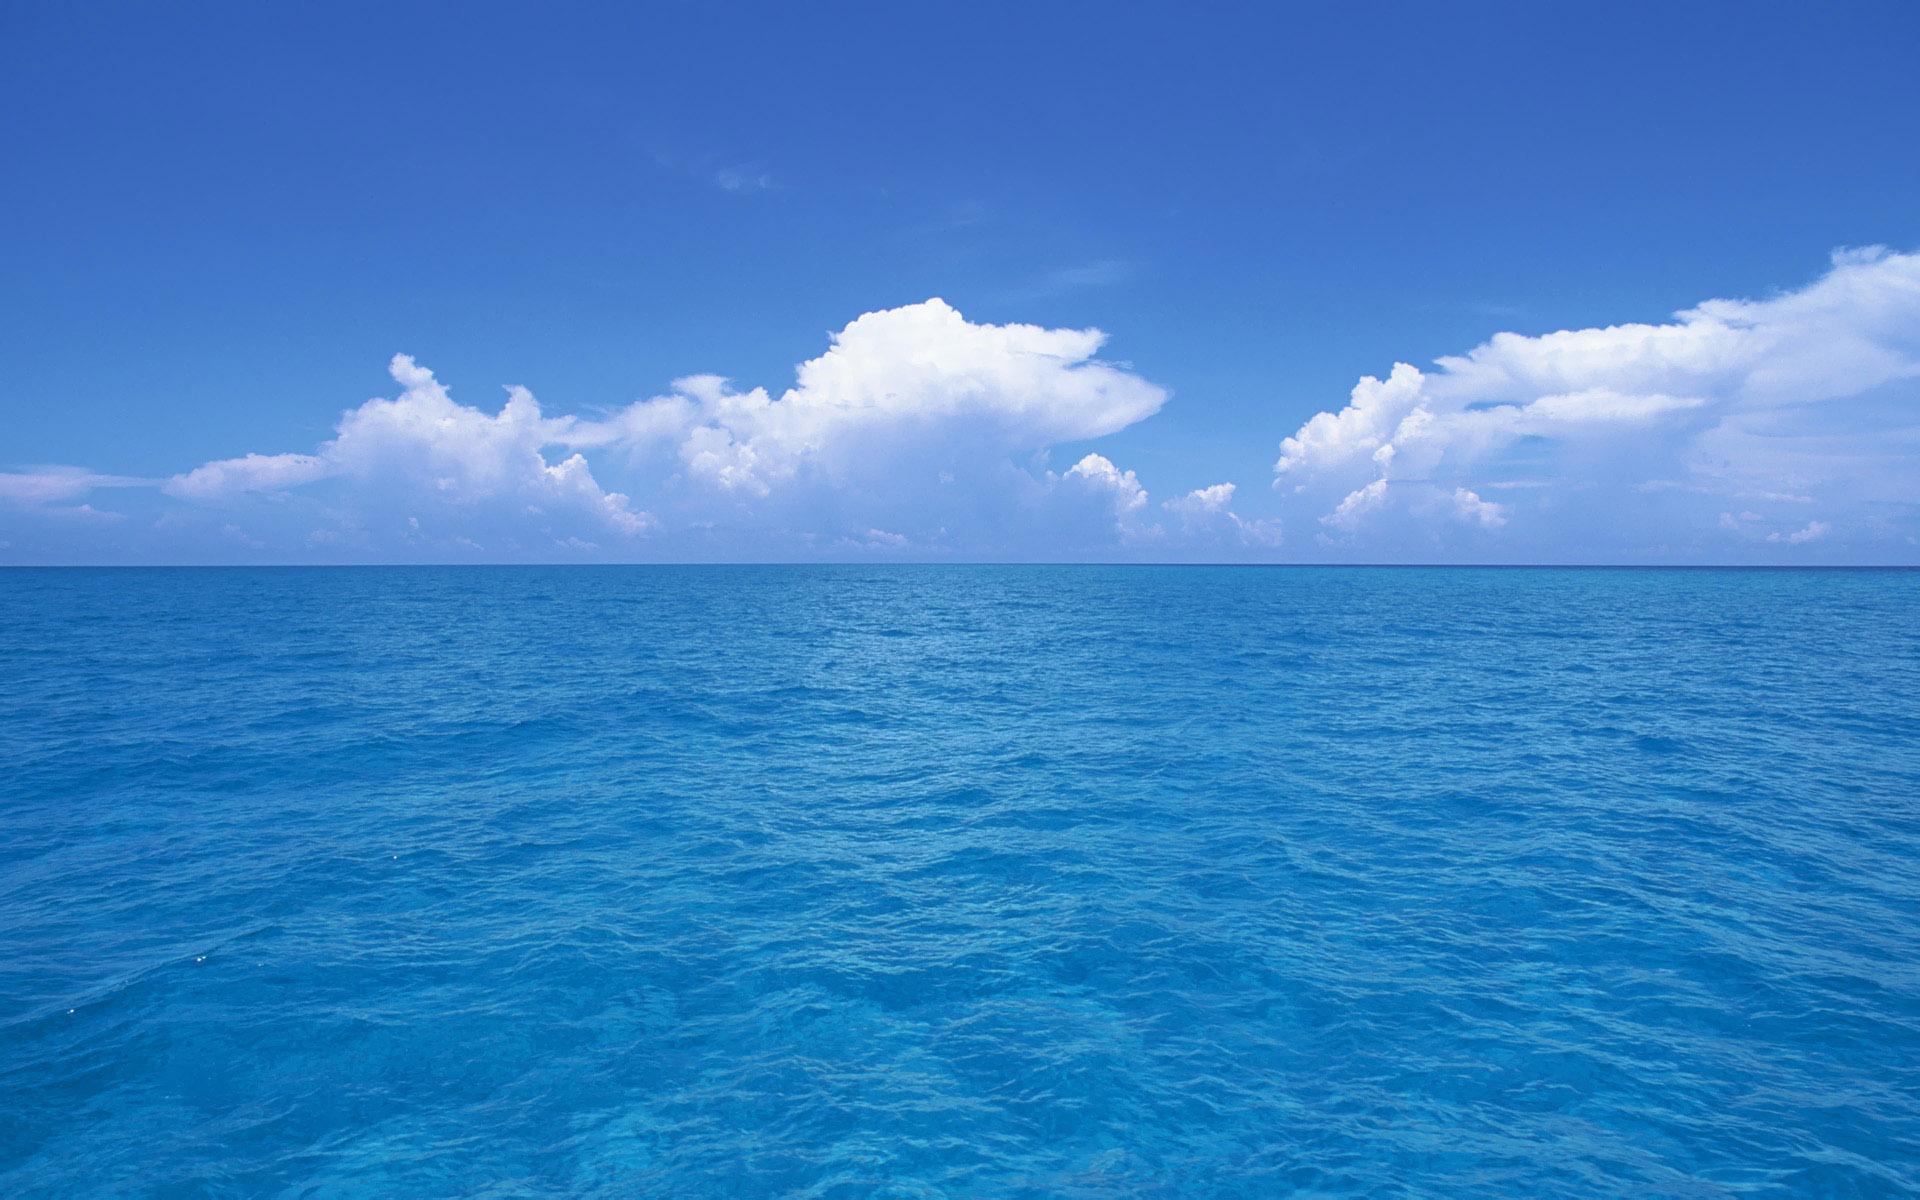 Mar azul - 1920x1200